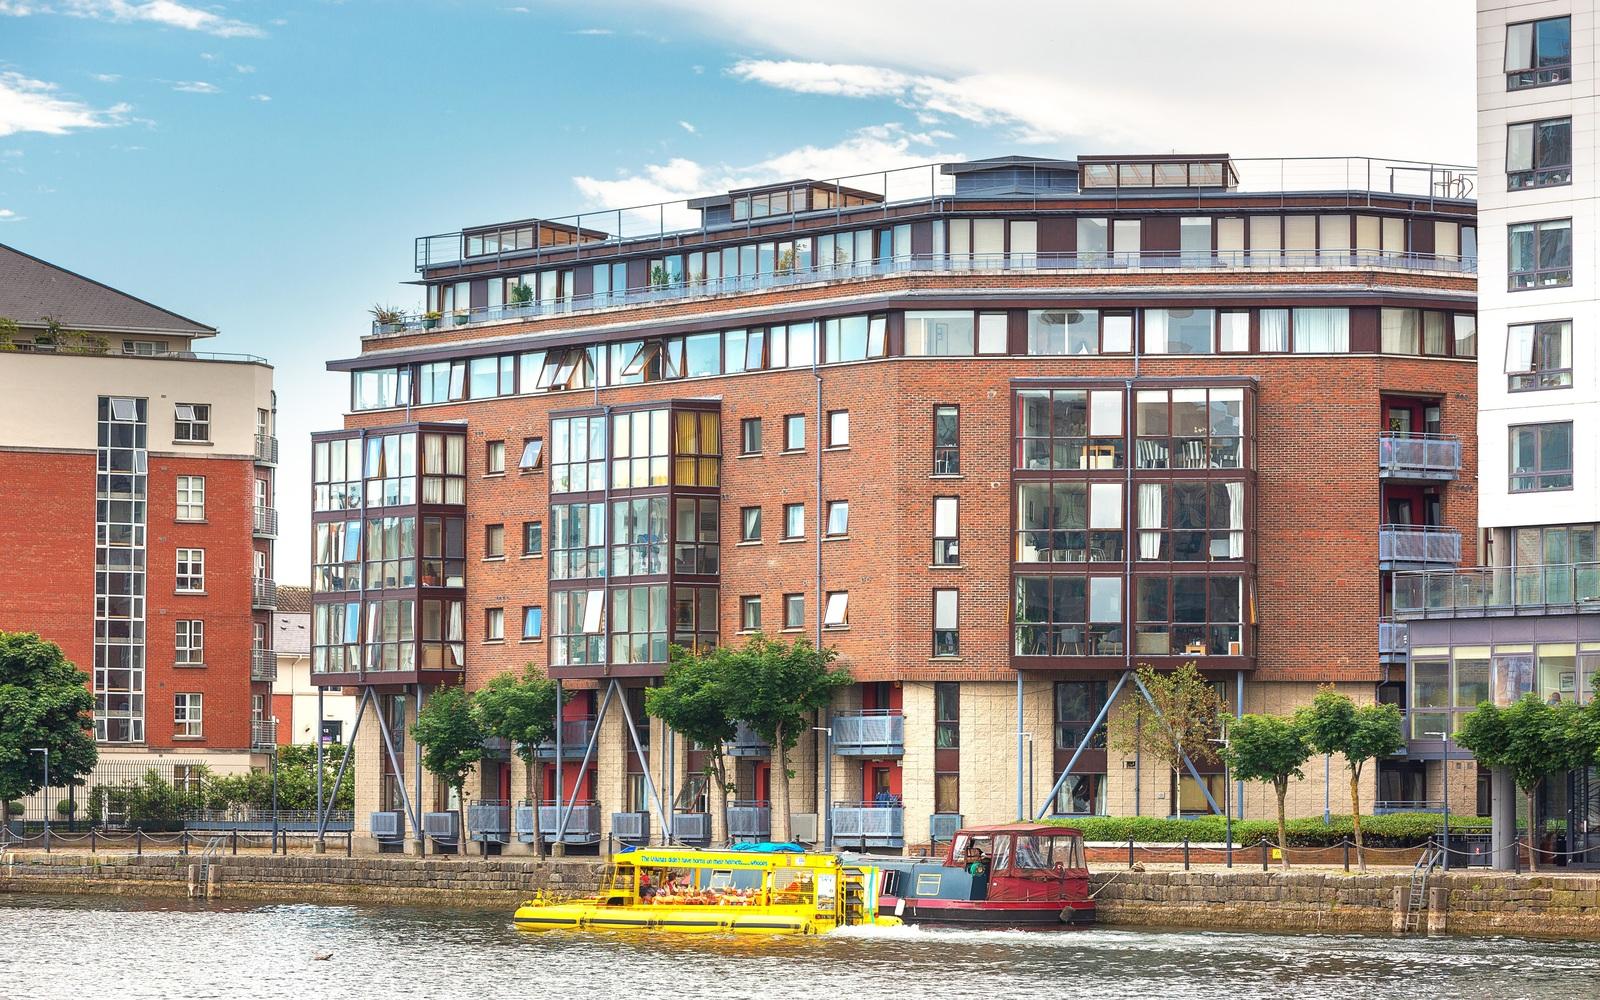 145 The Jessop, Charlotte Quay Dock, Grand Canal Dock, Dublin 4